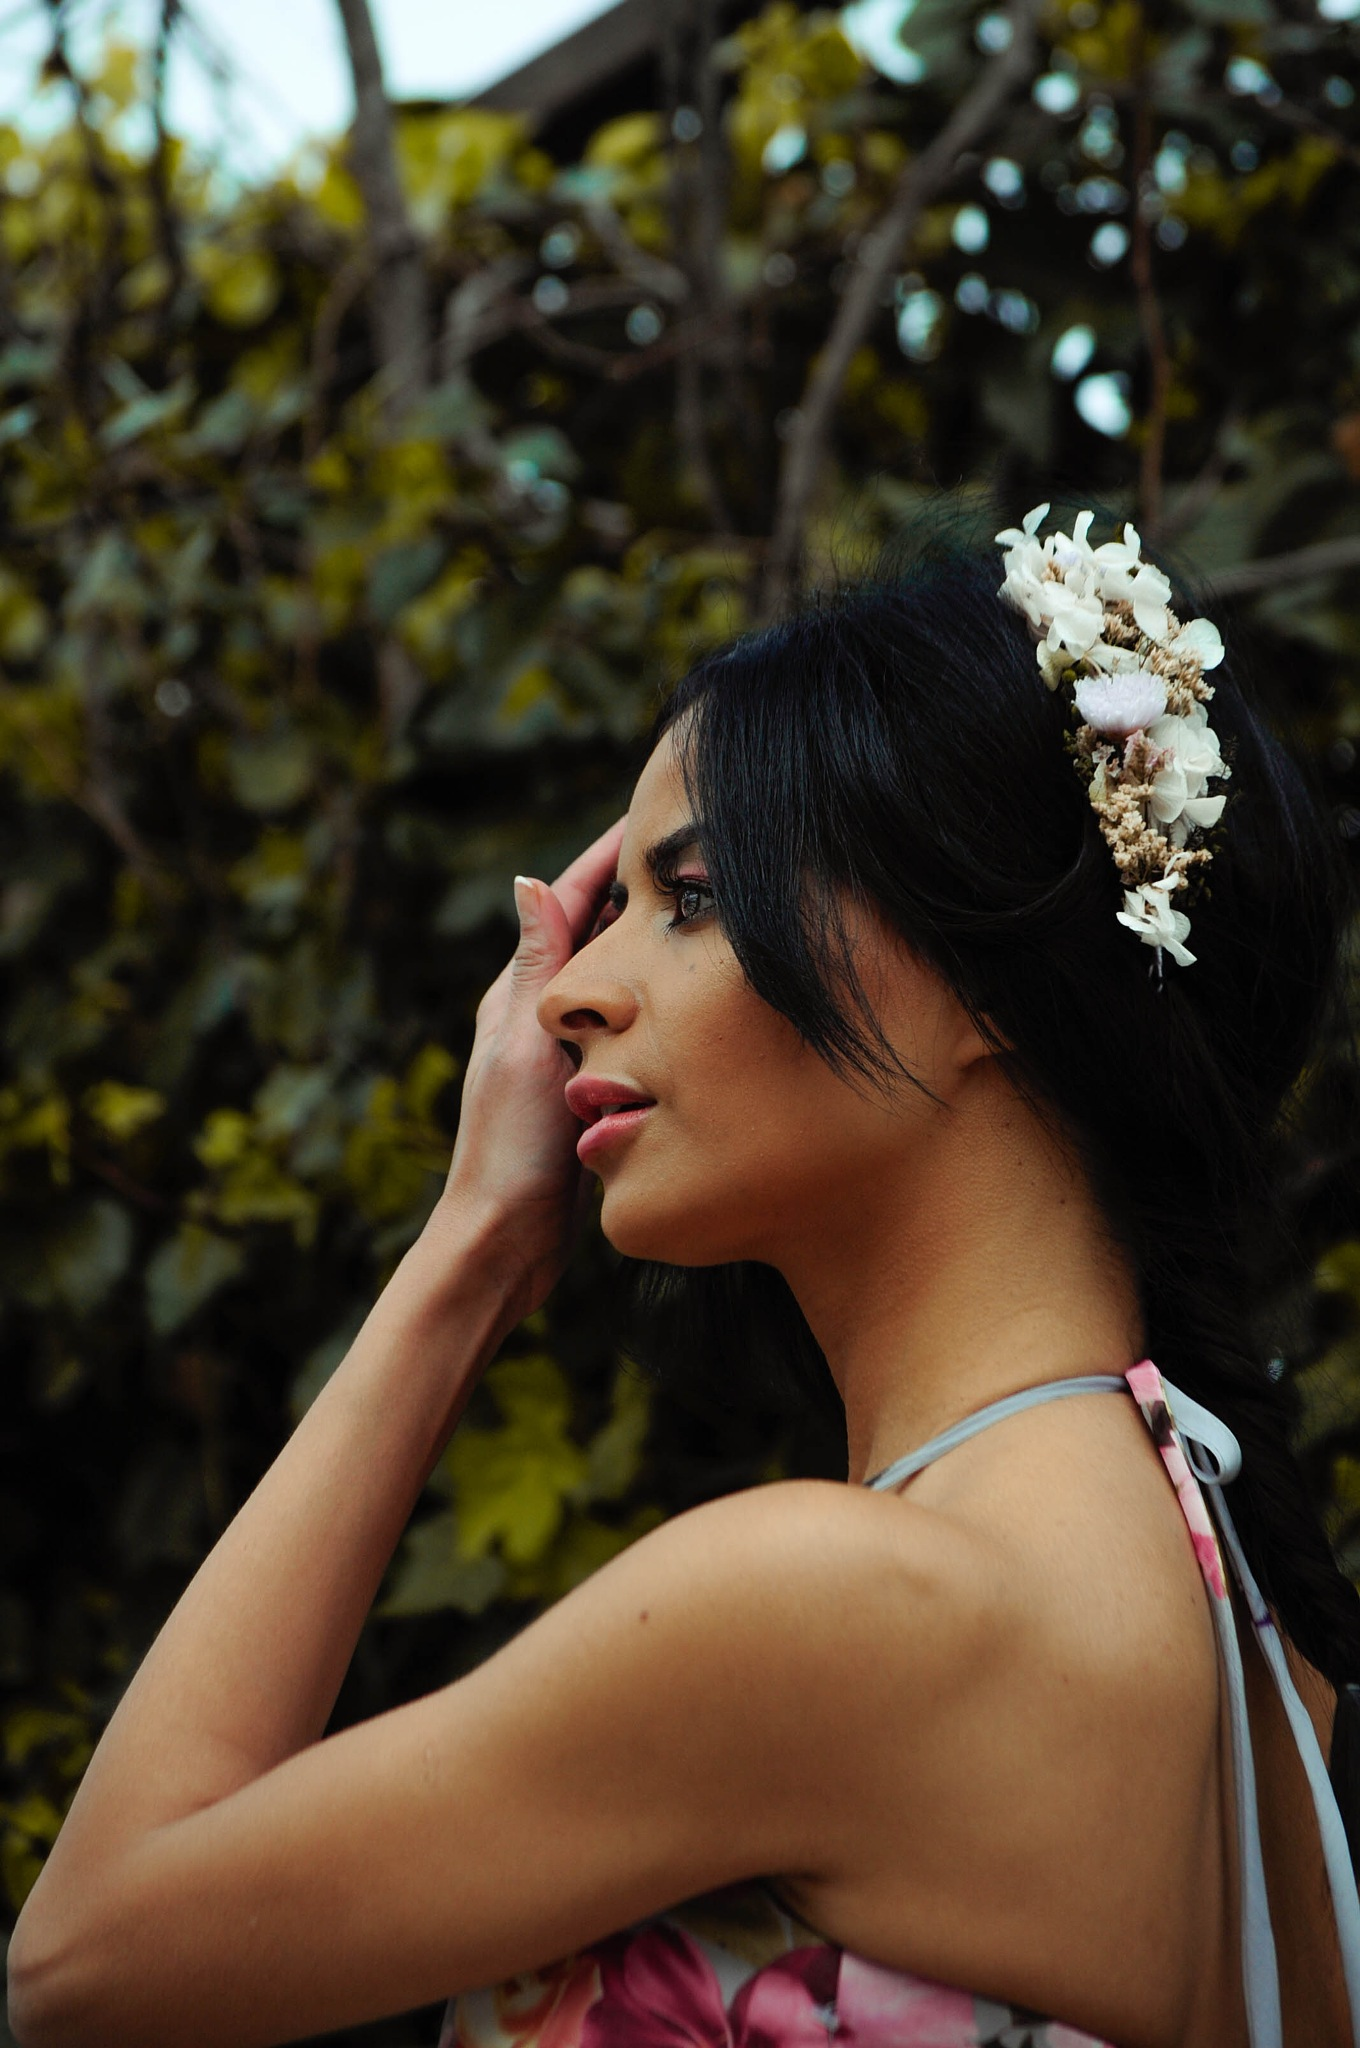 The bridesmaid by Itziar Lorente